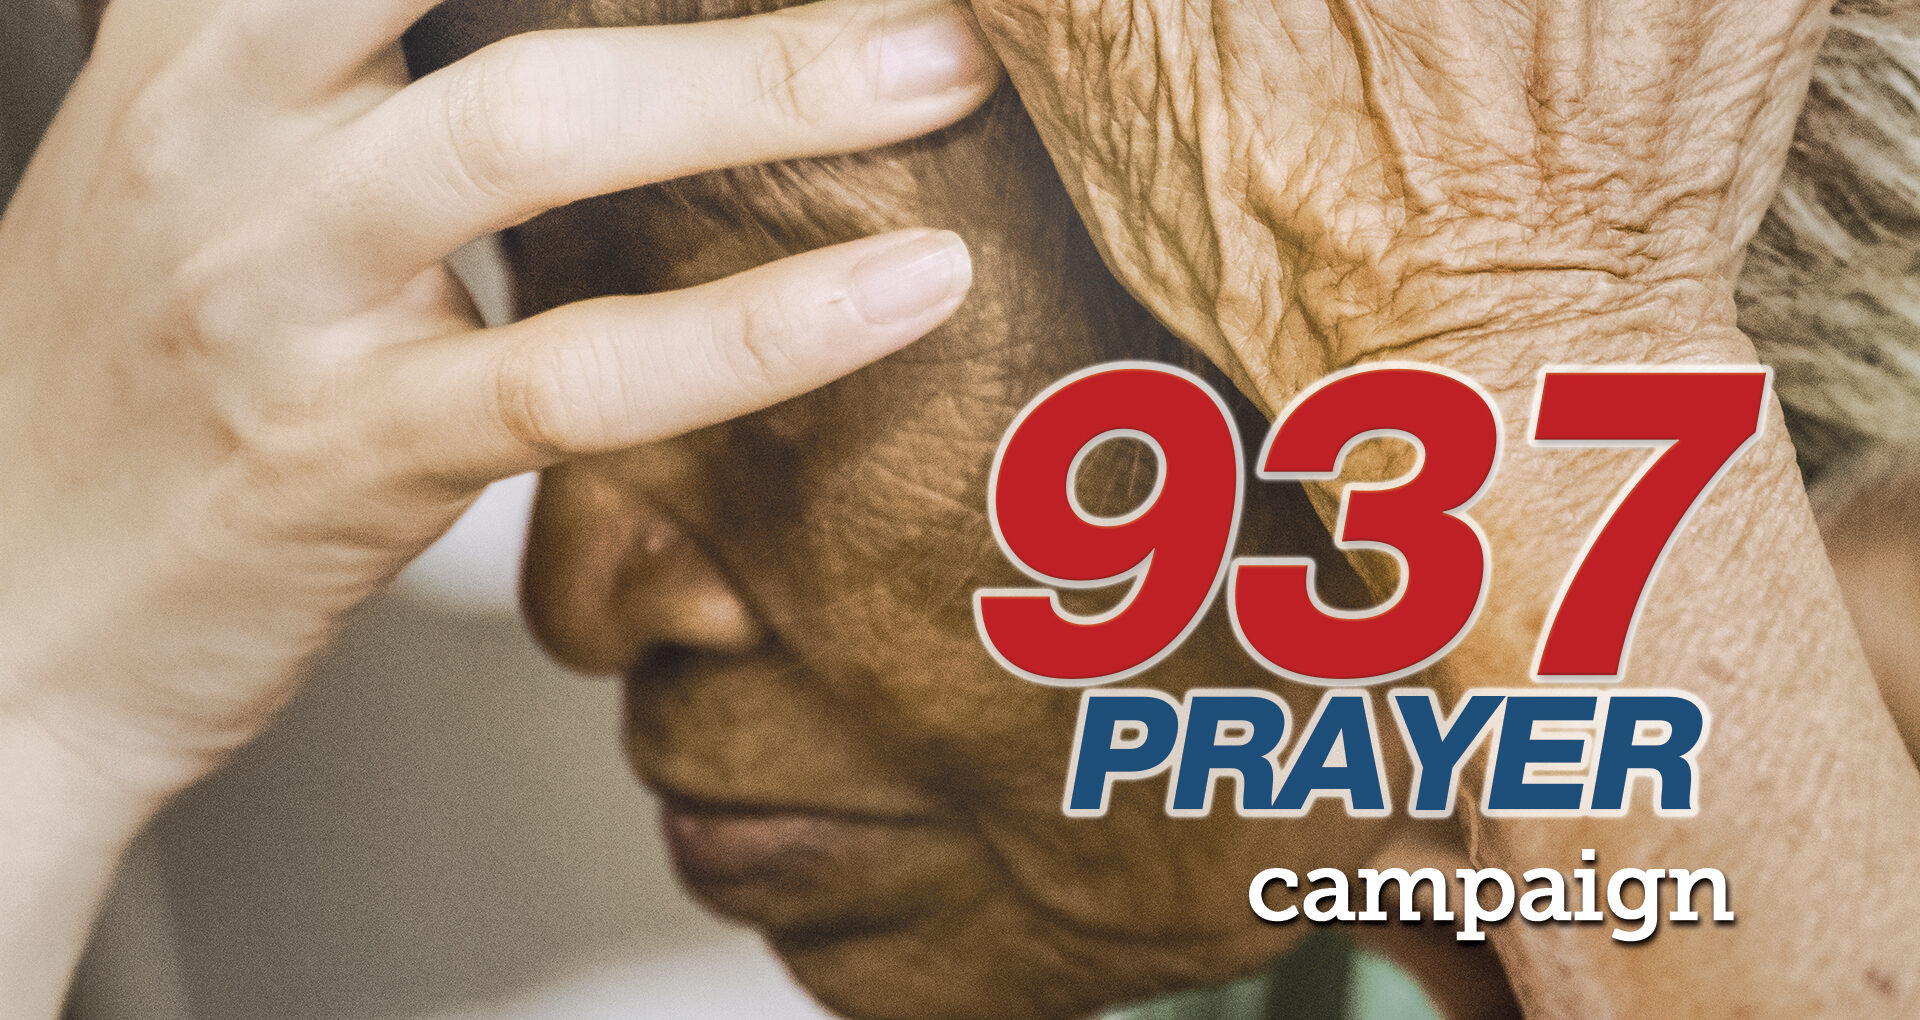 CINA-slide-937-prayer